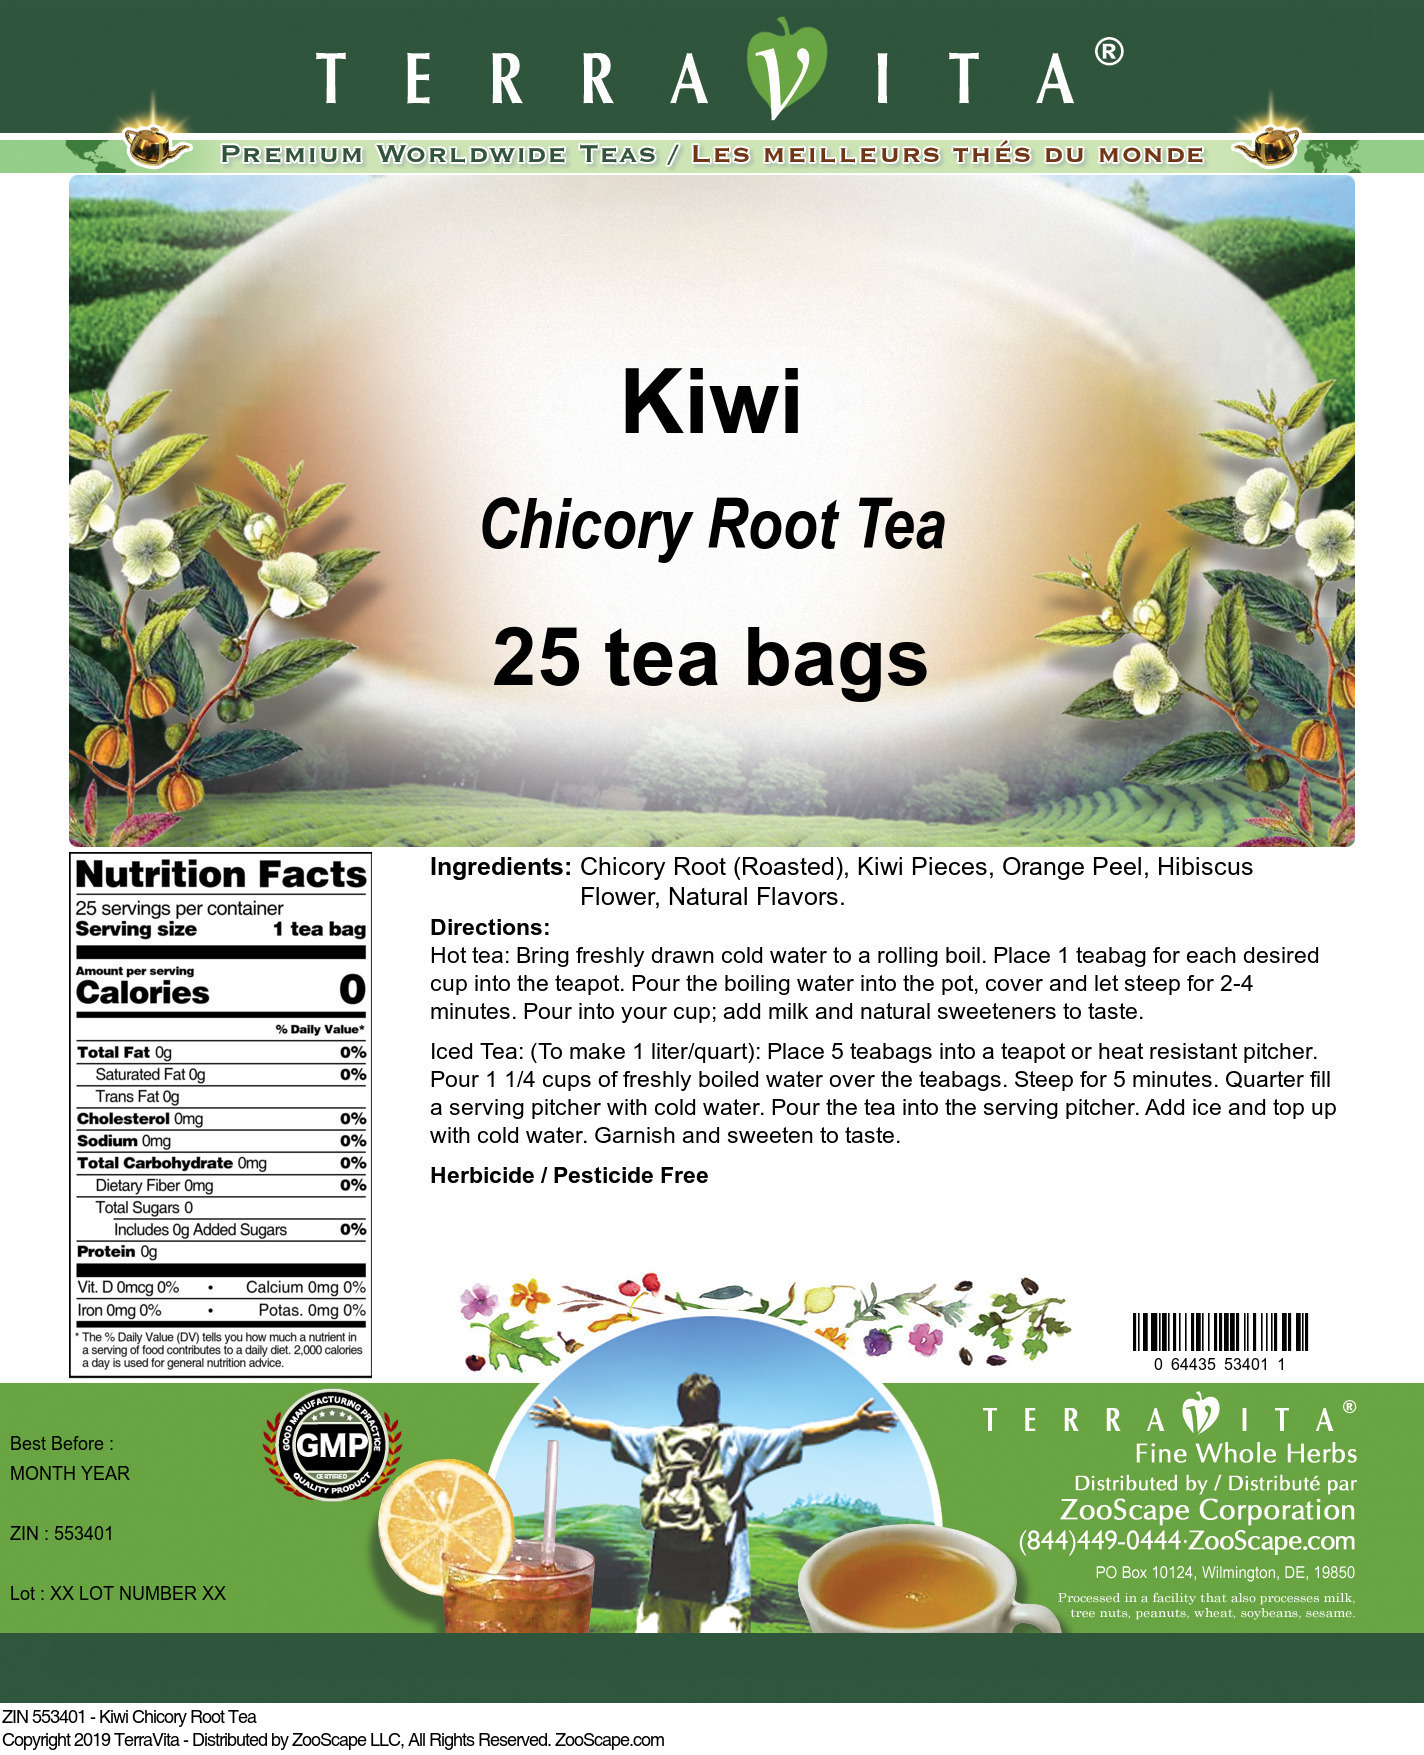 Kiwi Chicory Root Tea